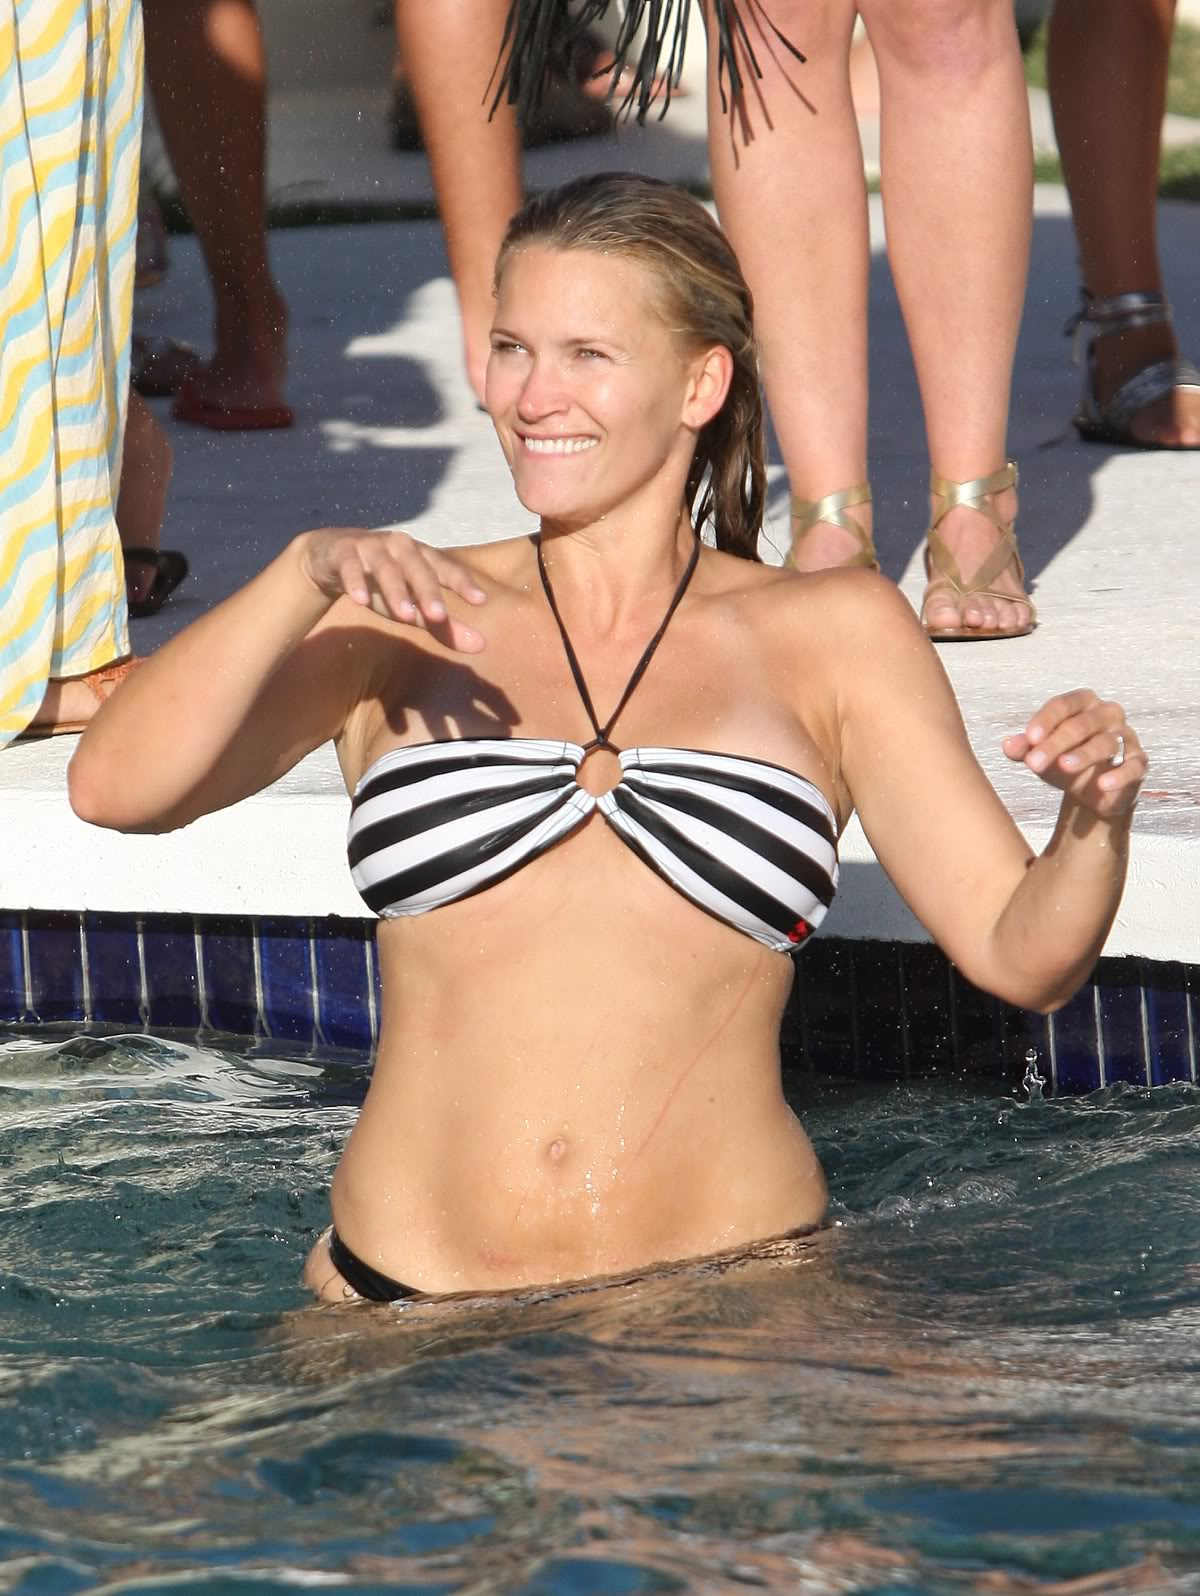 http://1.bp.blogspot.com/-ETdIwsJSVm8/ToSqq-tLWSI/AAAAAAAAAgg/ye6d5BCbar4/s1600/natasha-henstridge-bikini-02.jpg